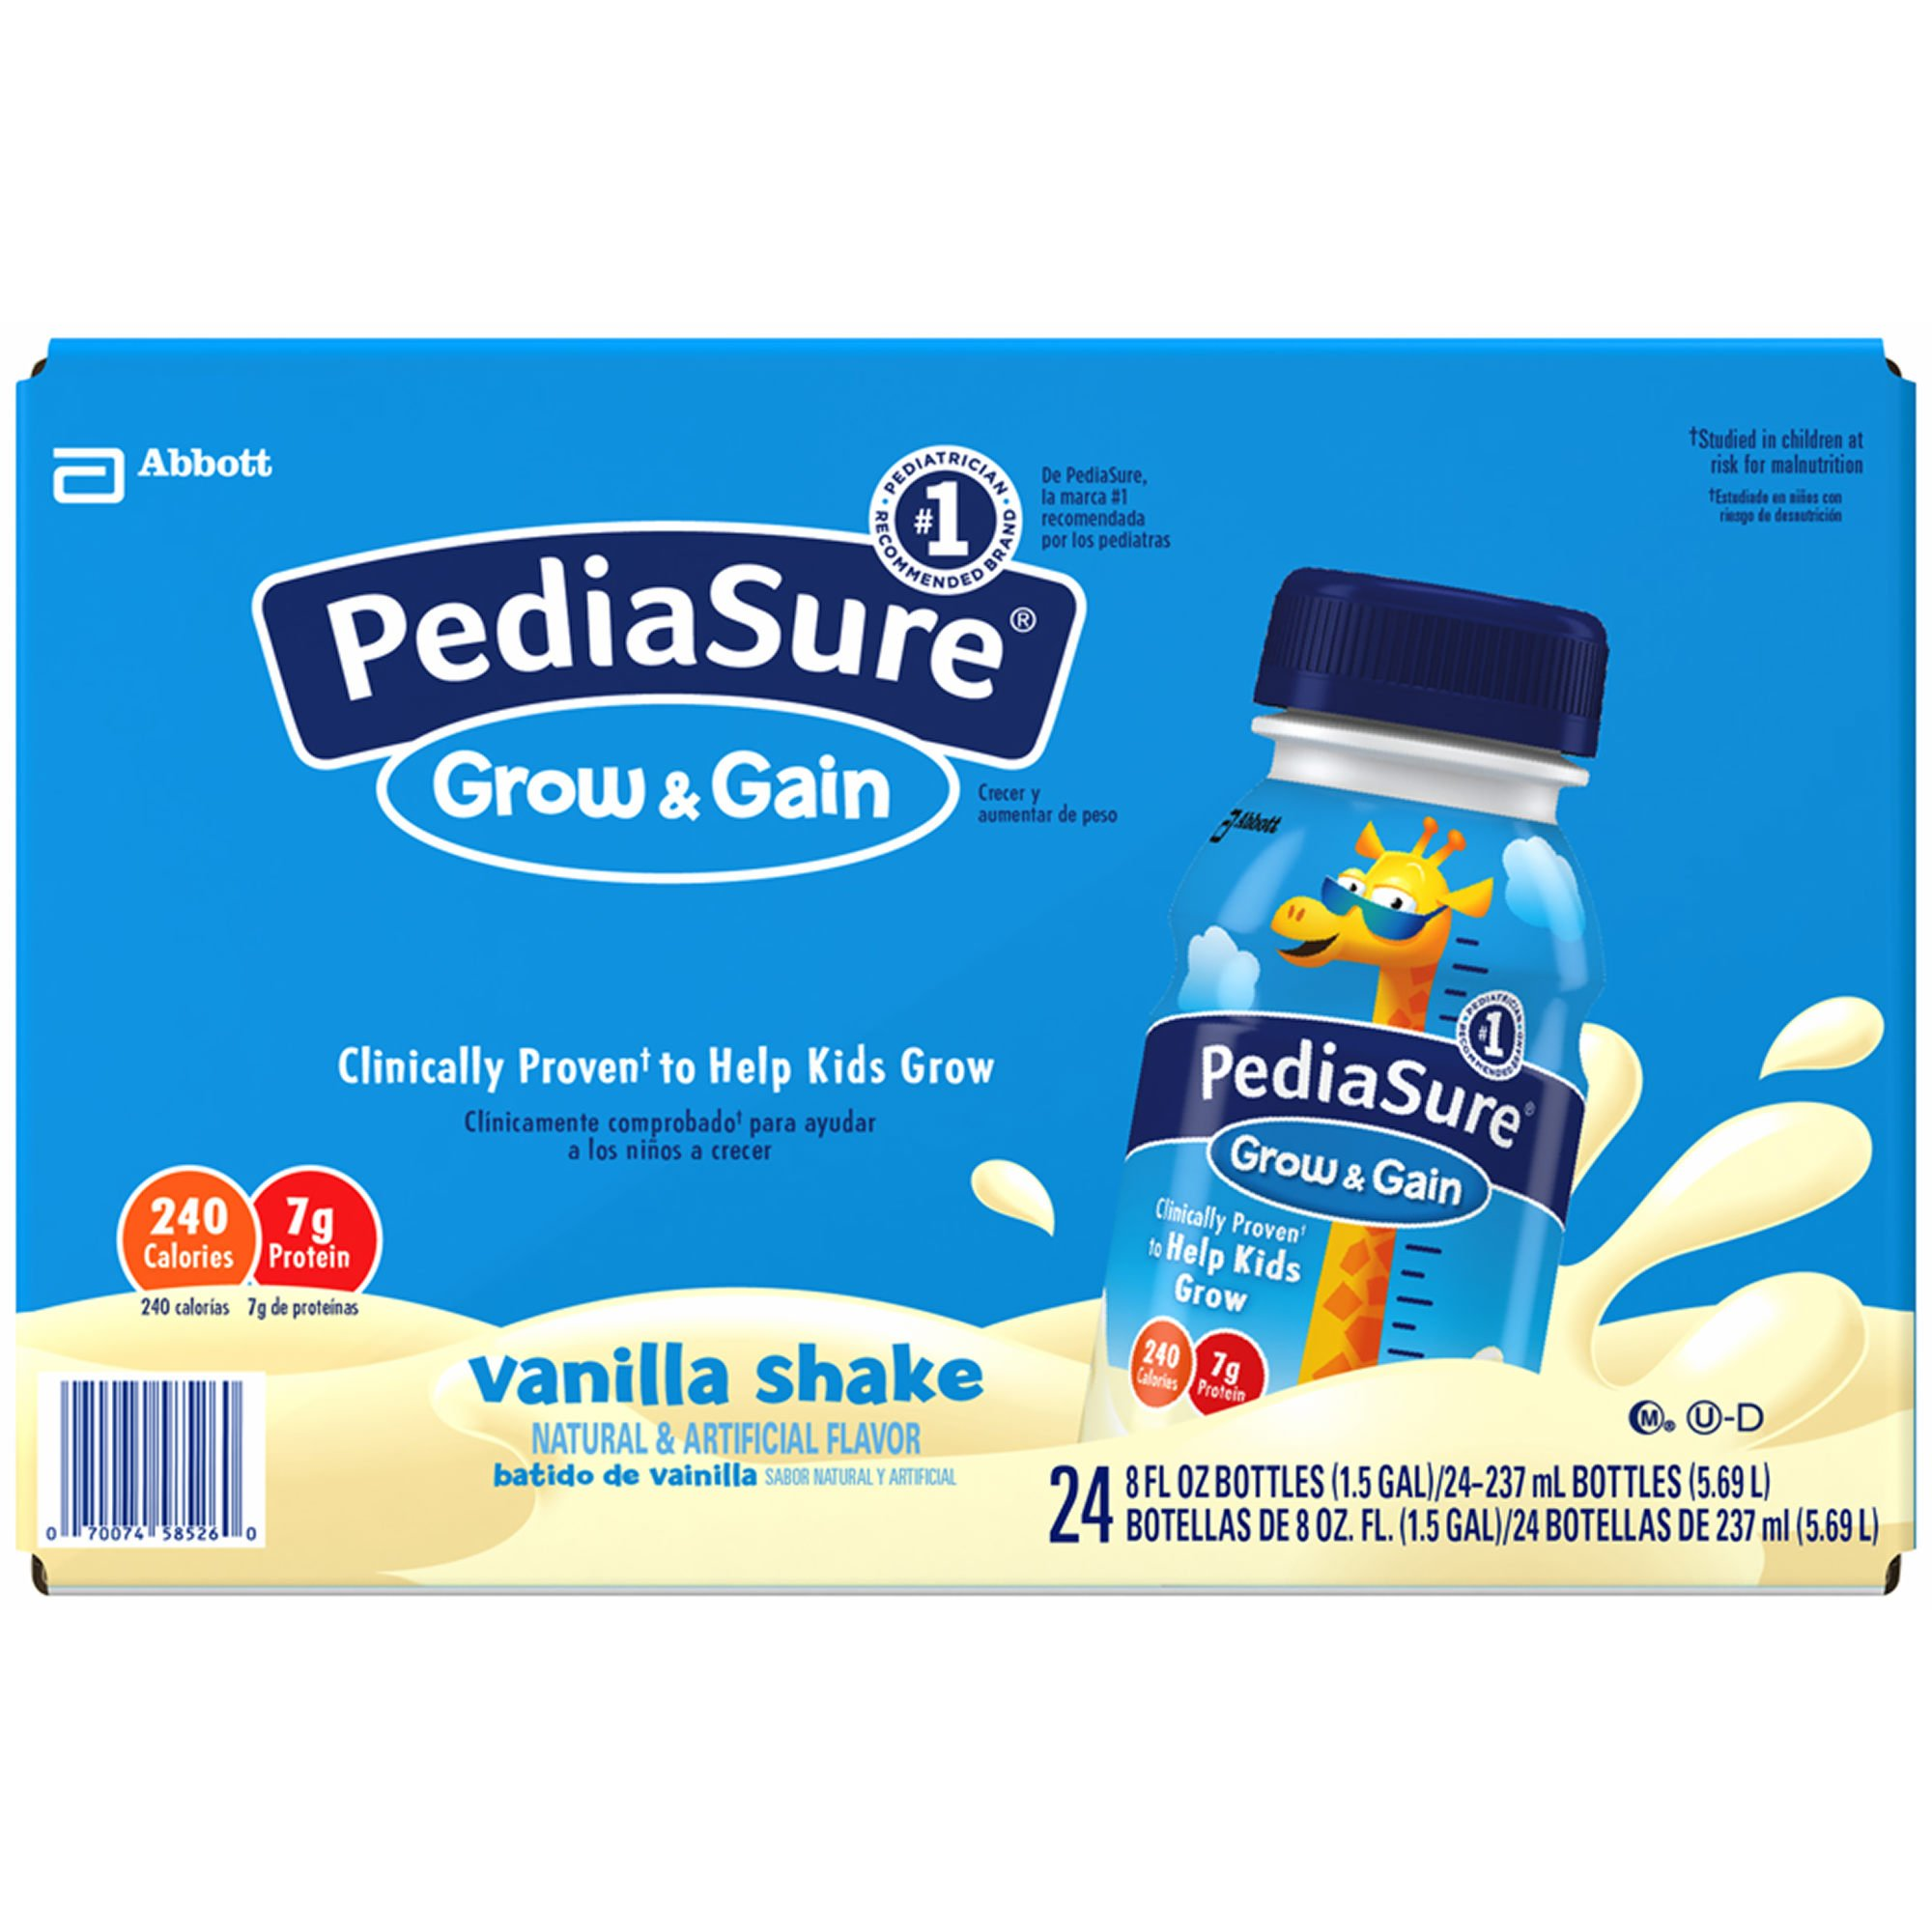 PediaSure Vanilla Shake, 24 pk./8 oz. (pack of 2) by Pediasure (Image #1)